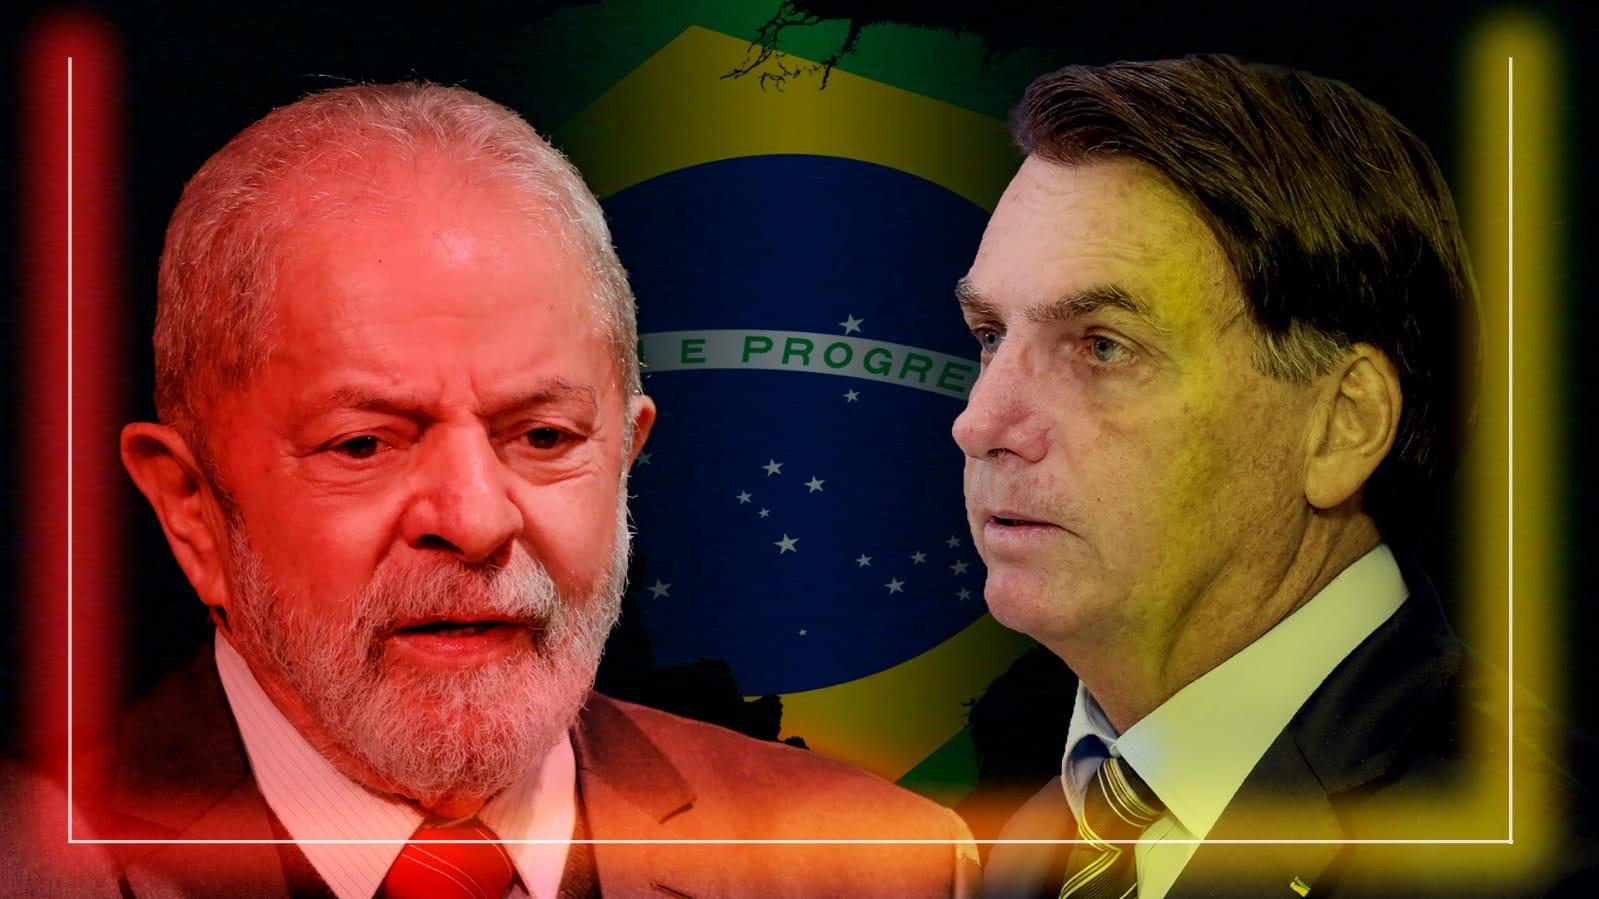 Lula lidera corrida presidencial contra Bolsonaro, aponta pesquisa